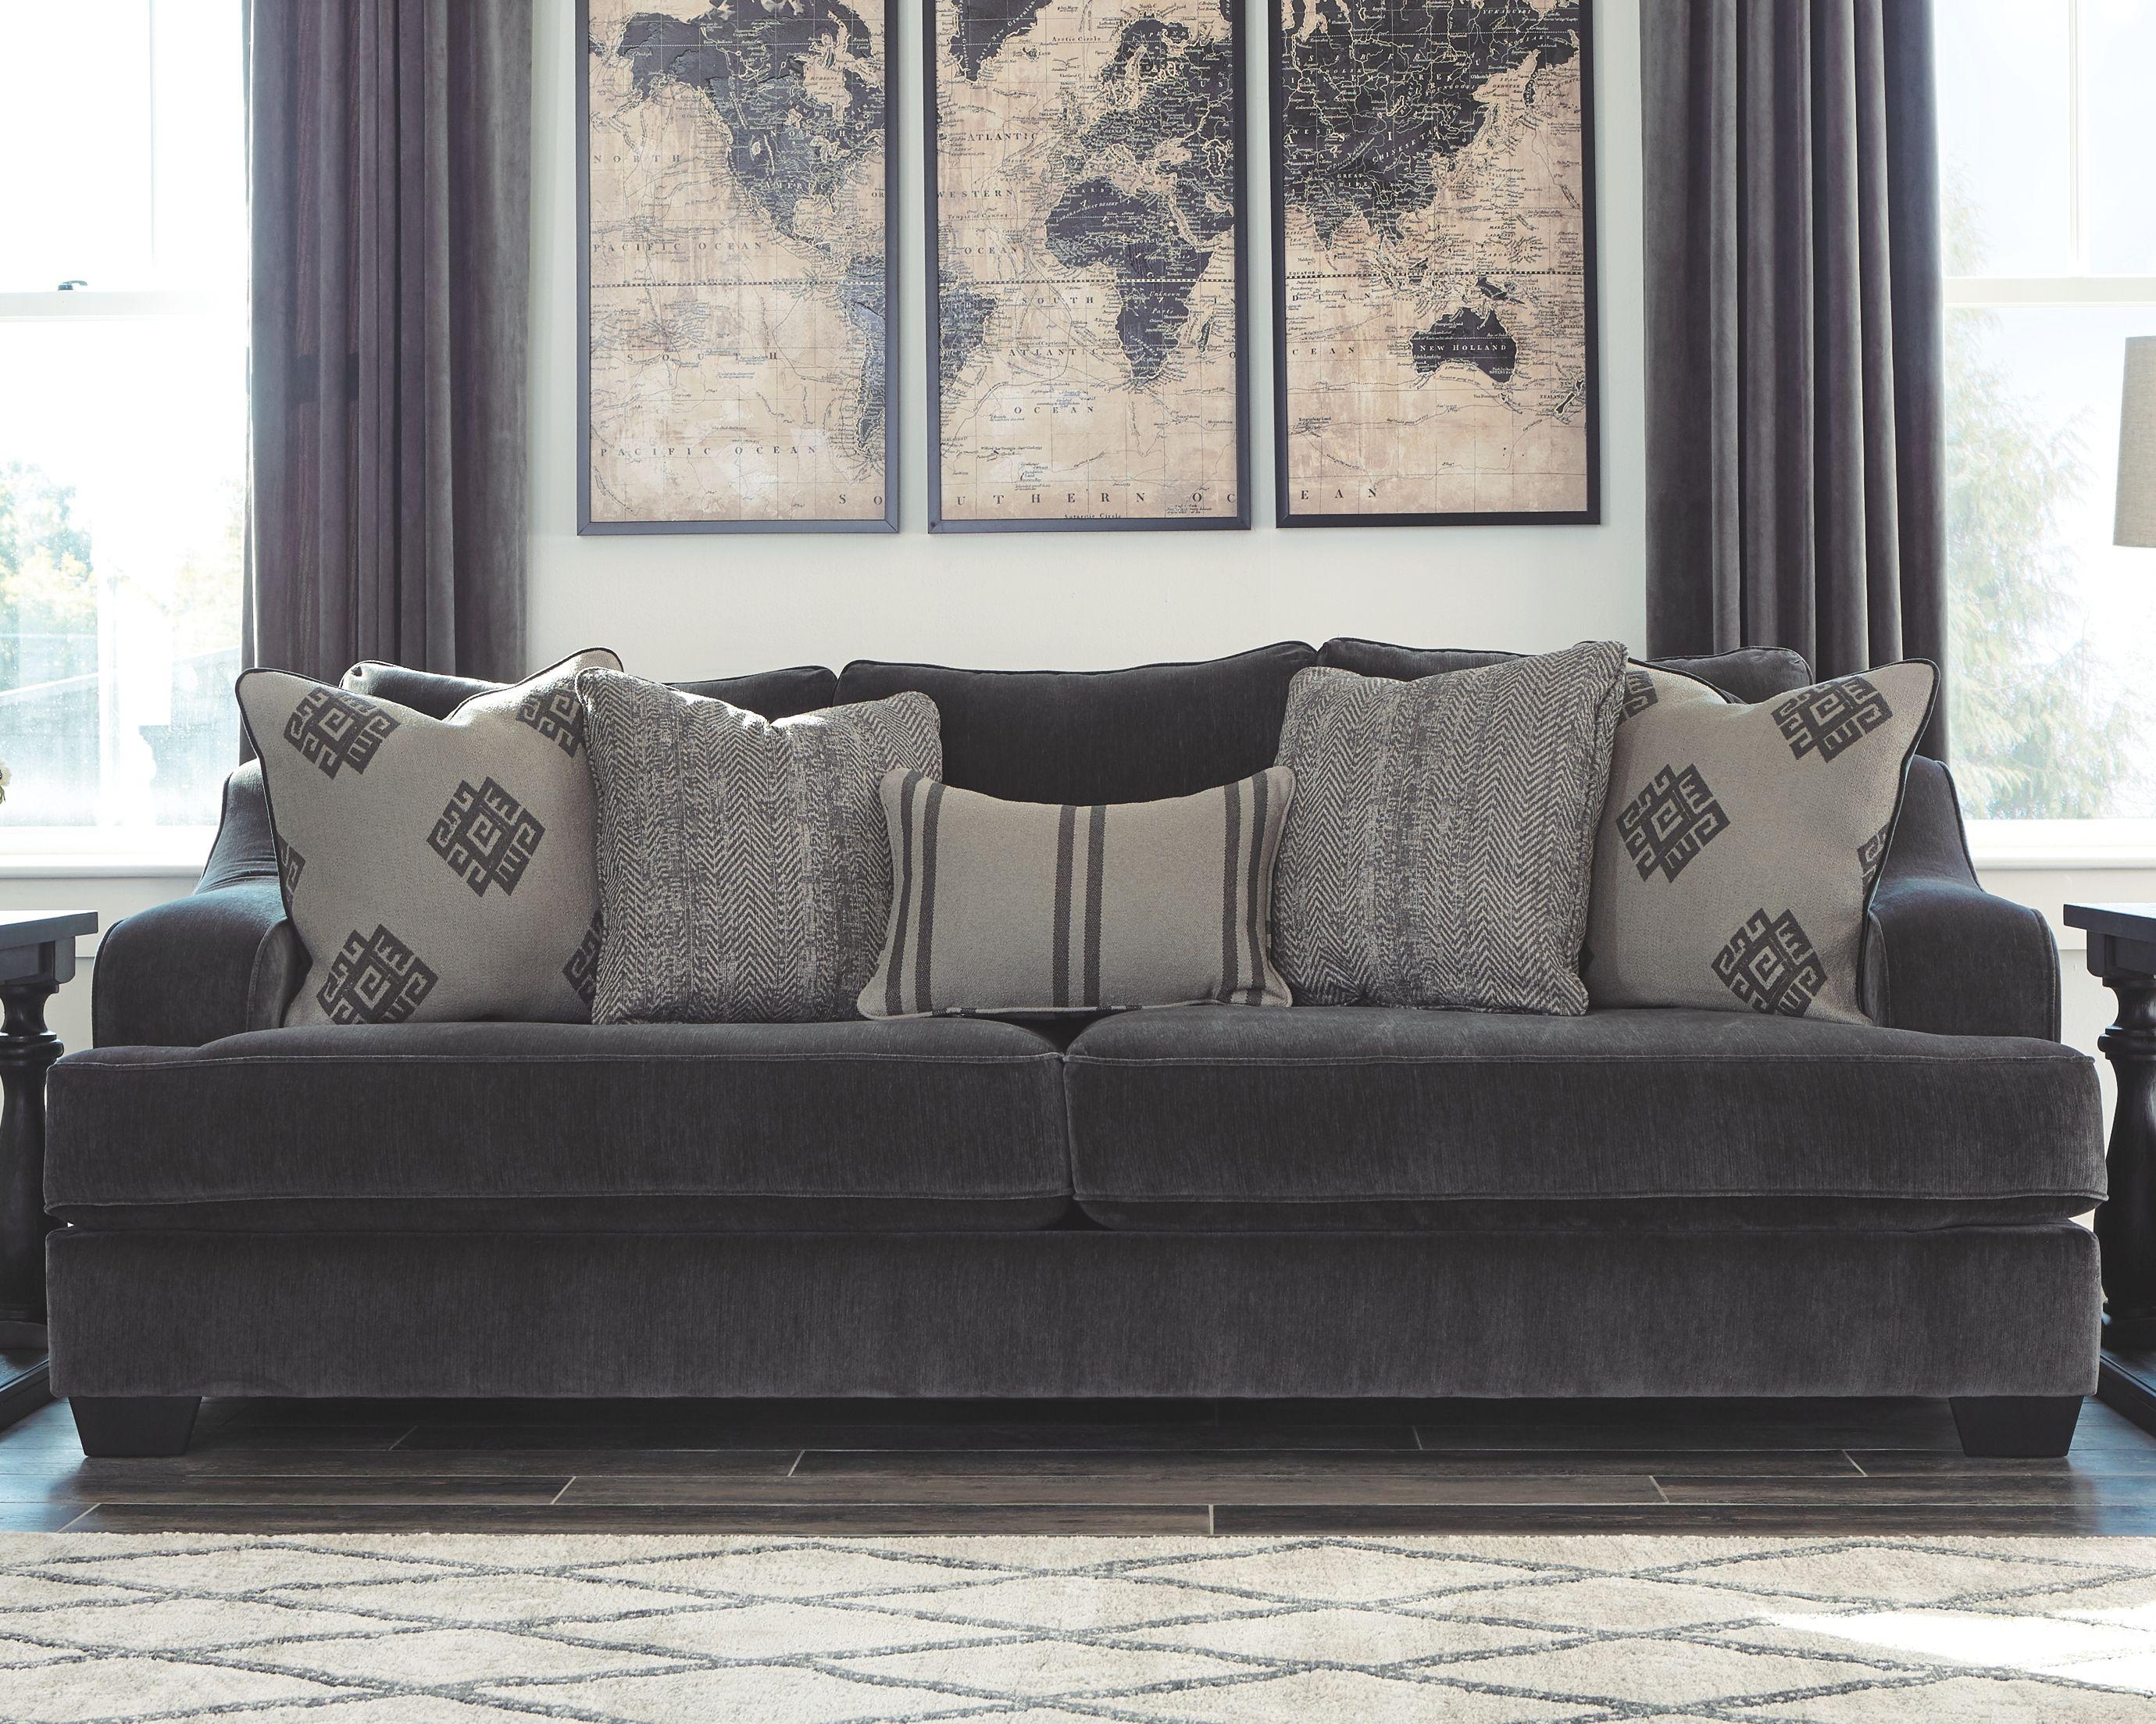 Corvara sofa ink sofa loveseat set couch loveseat